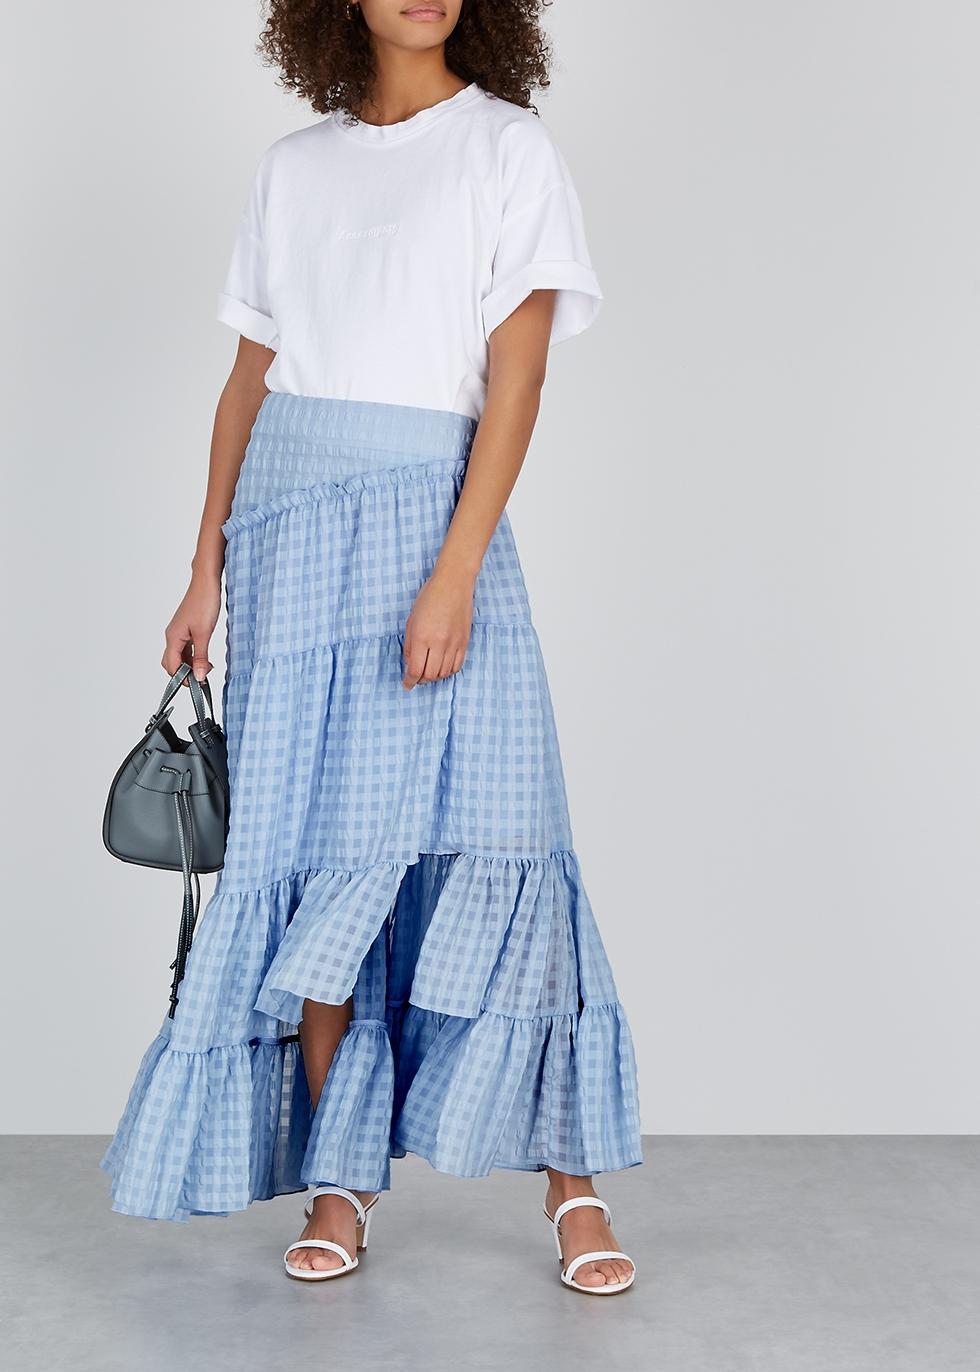 Periwinkle checked chiffon maxi skirt - 3.1 Phillip Lim